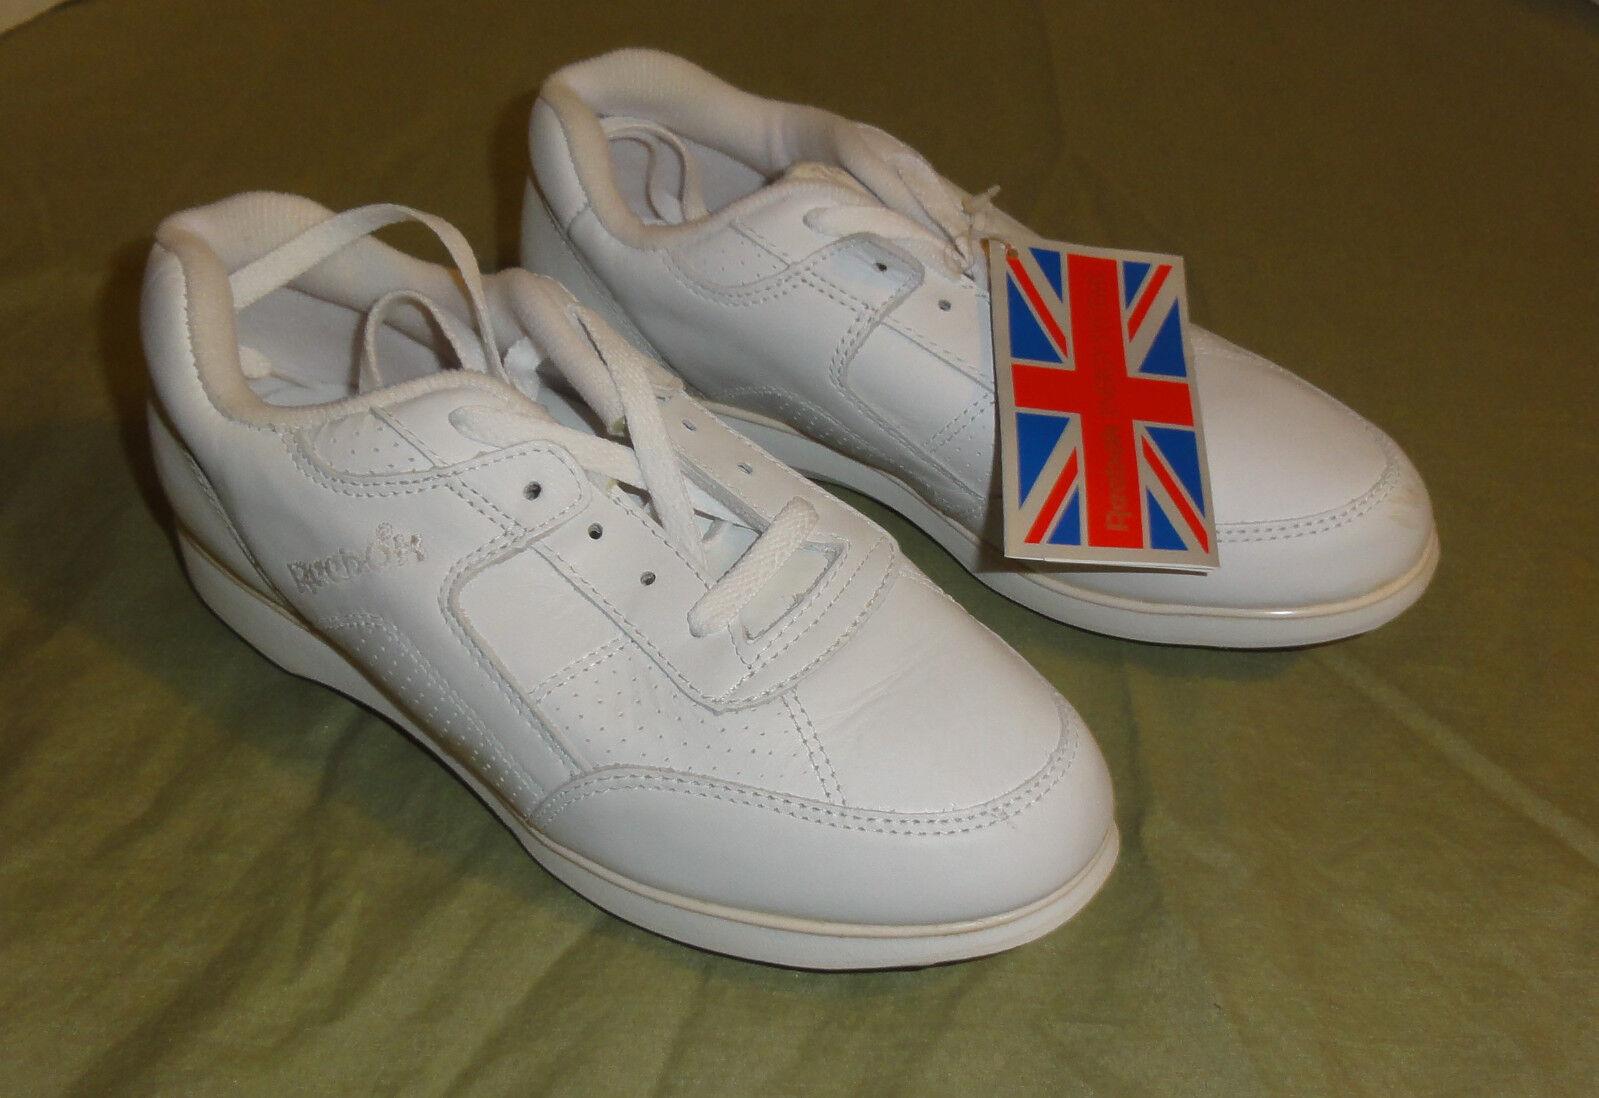 REEBOK Comfort I   Walking (Women's) White - Size 7 [NEW] Vintage shoes w  Box